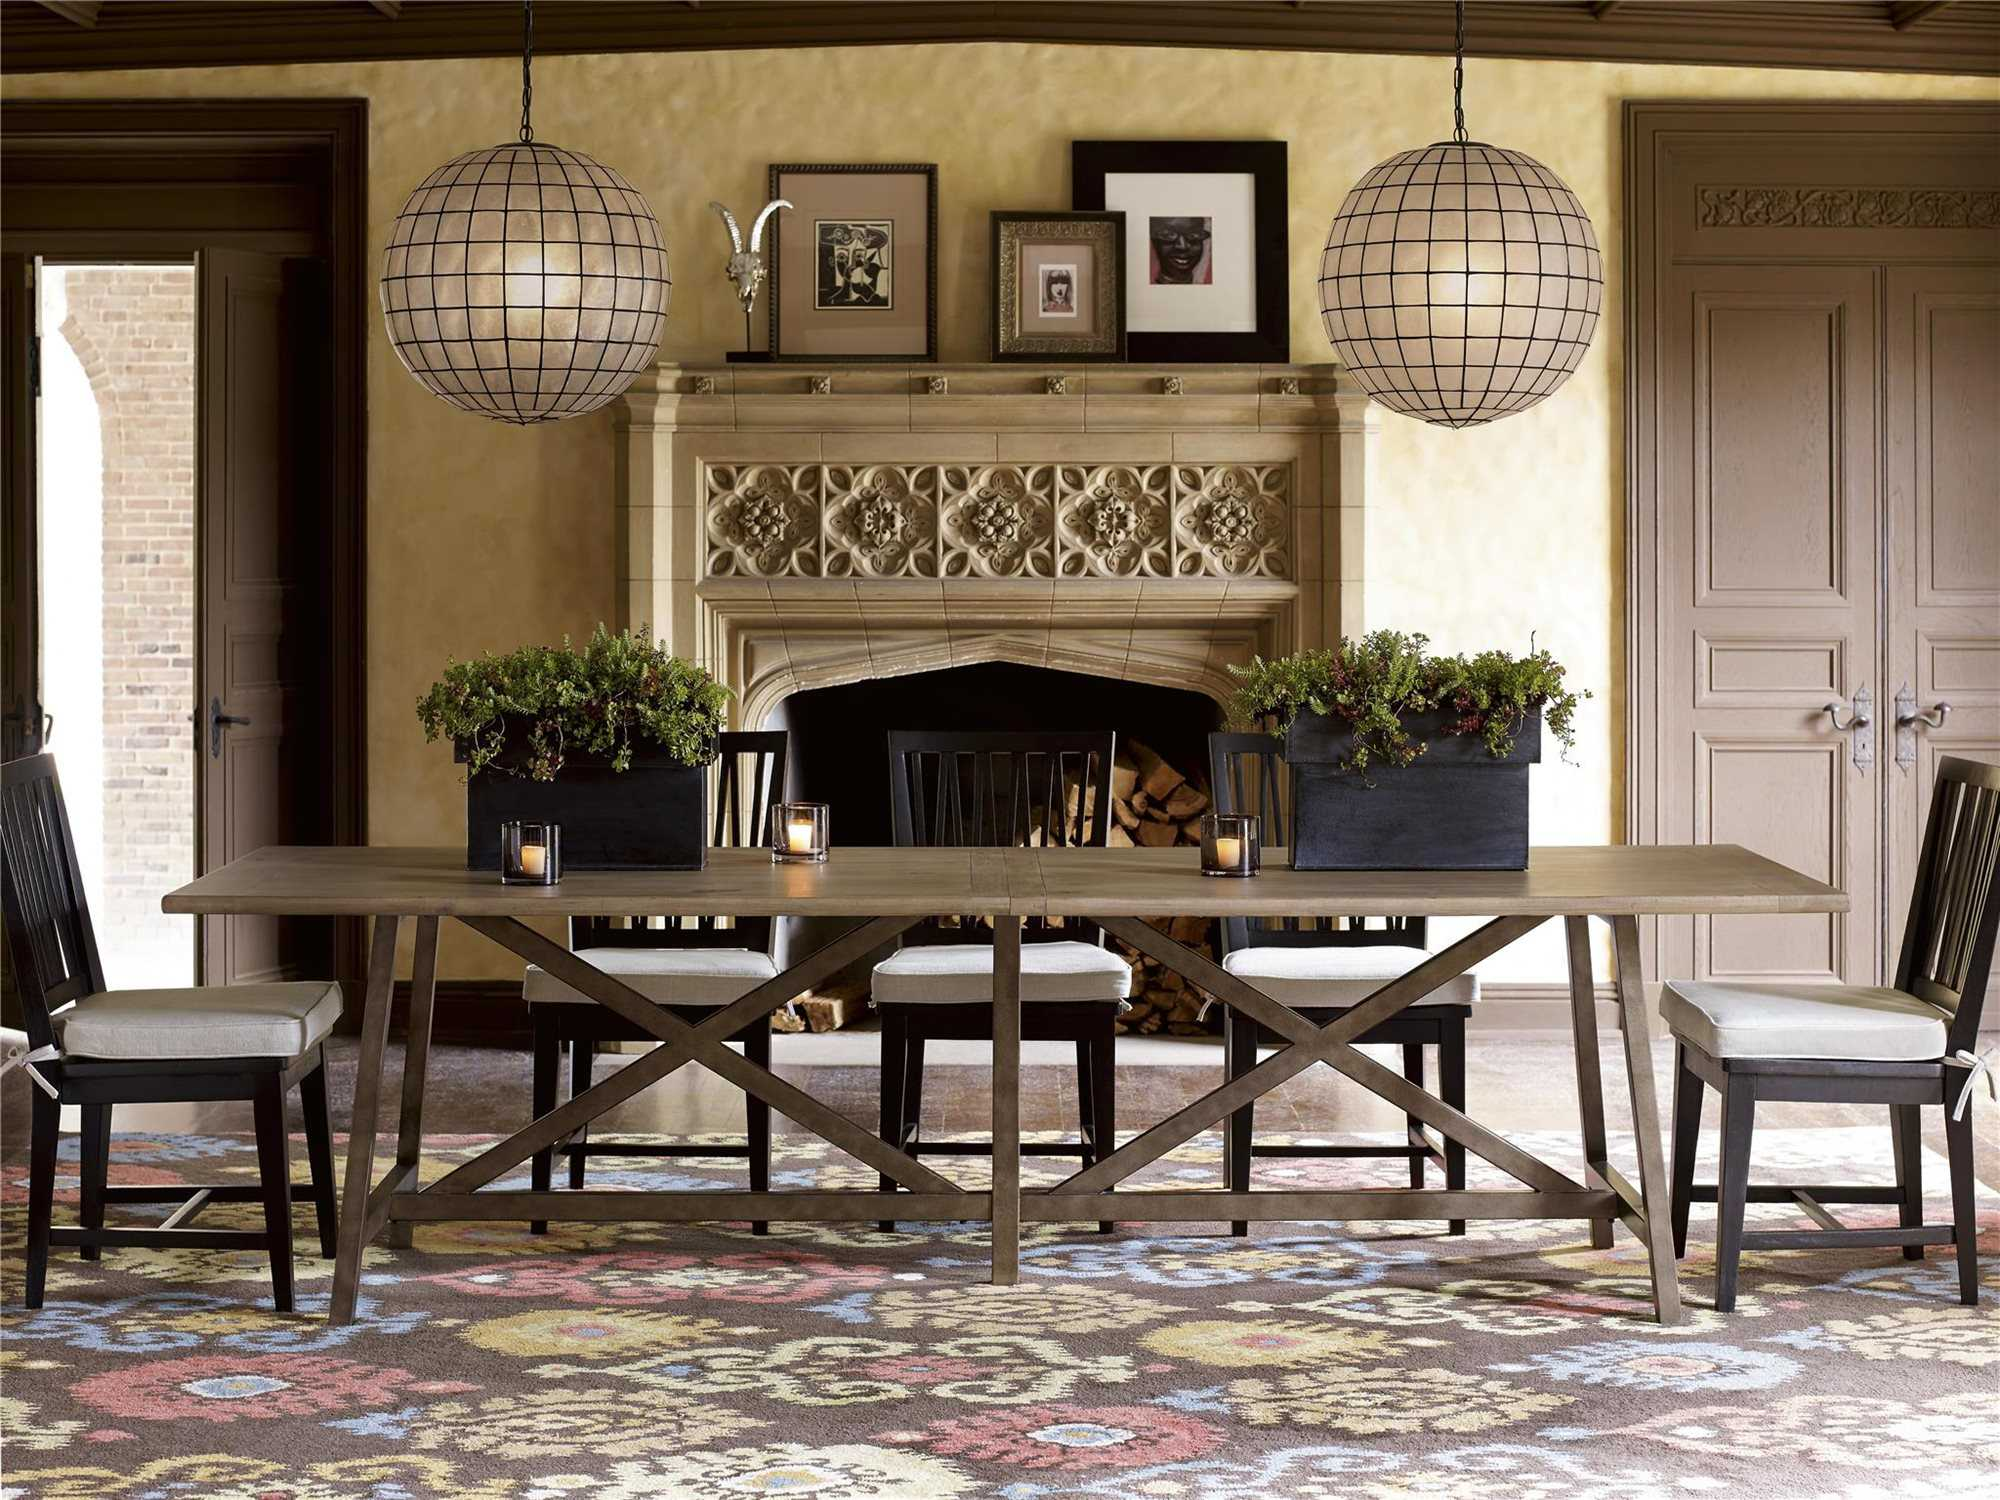 Universal furniture authenticity reunion dining set uf572656set2 - Universal furniture dining room set ...